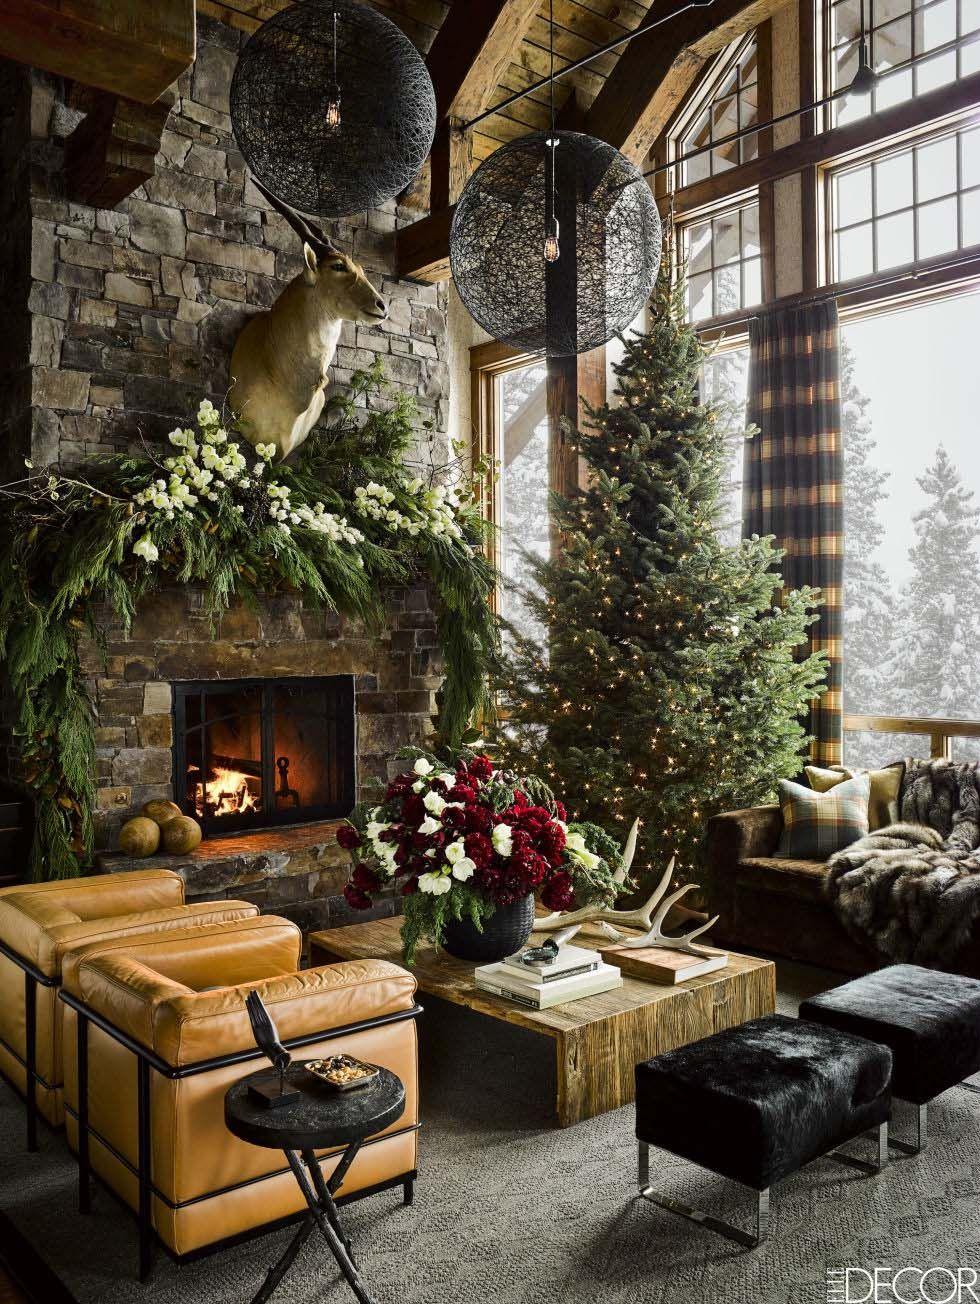 Photo of Wishing you the most magical Christmas season ever!